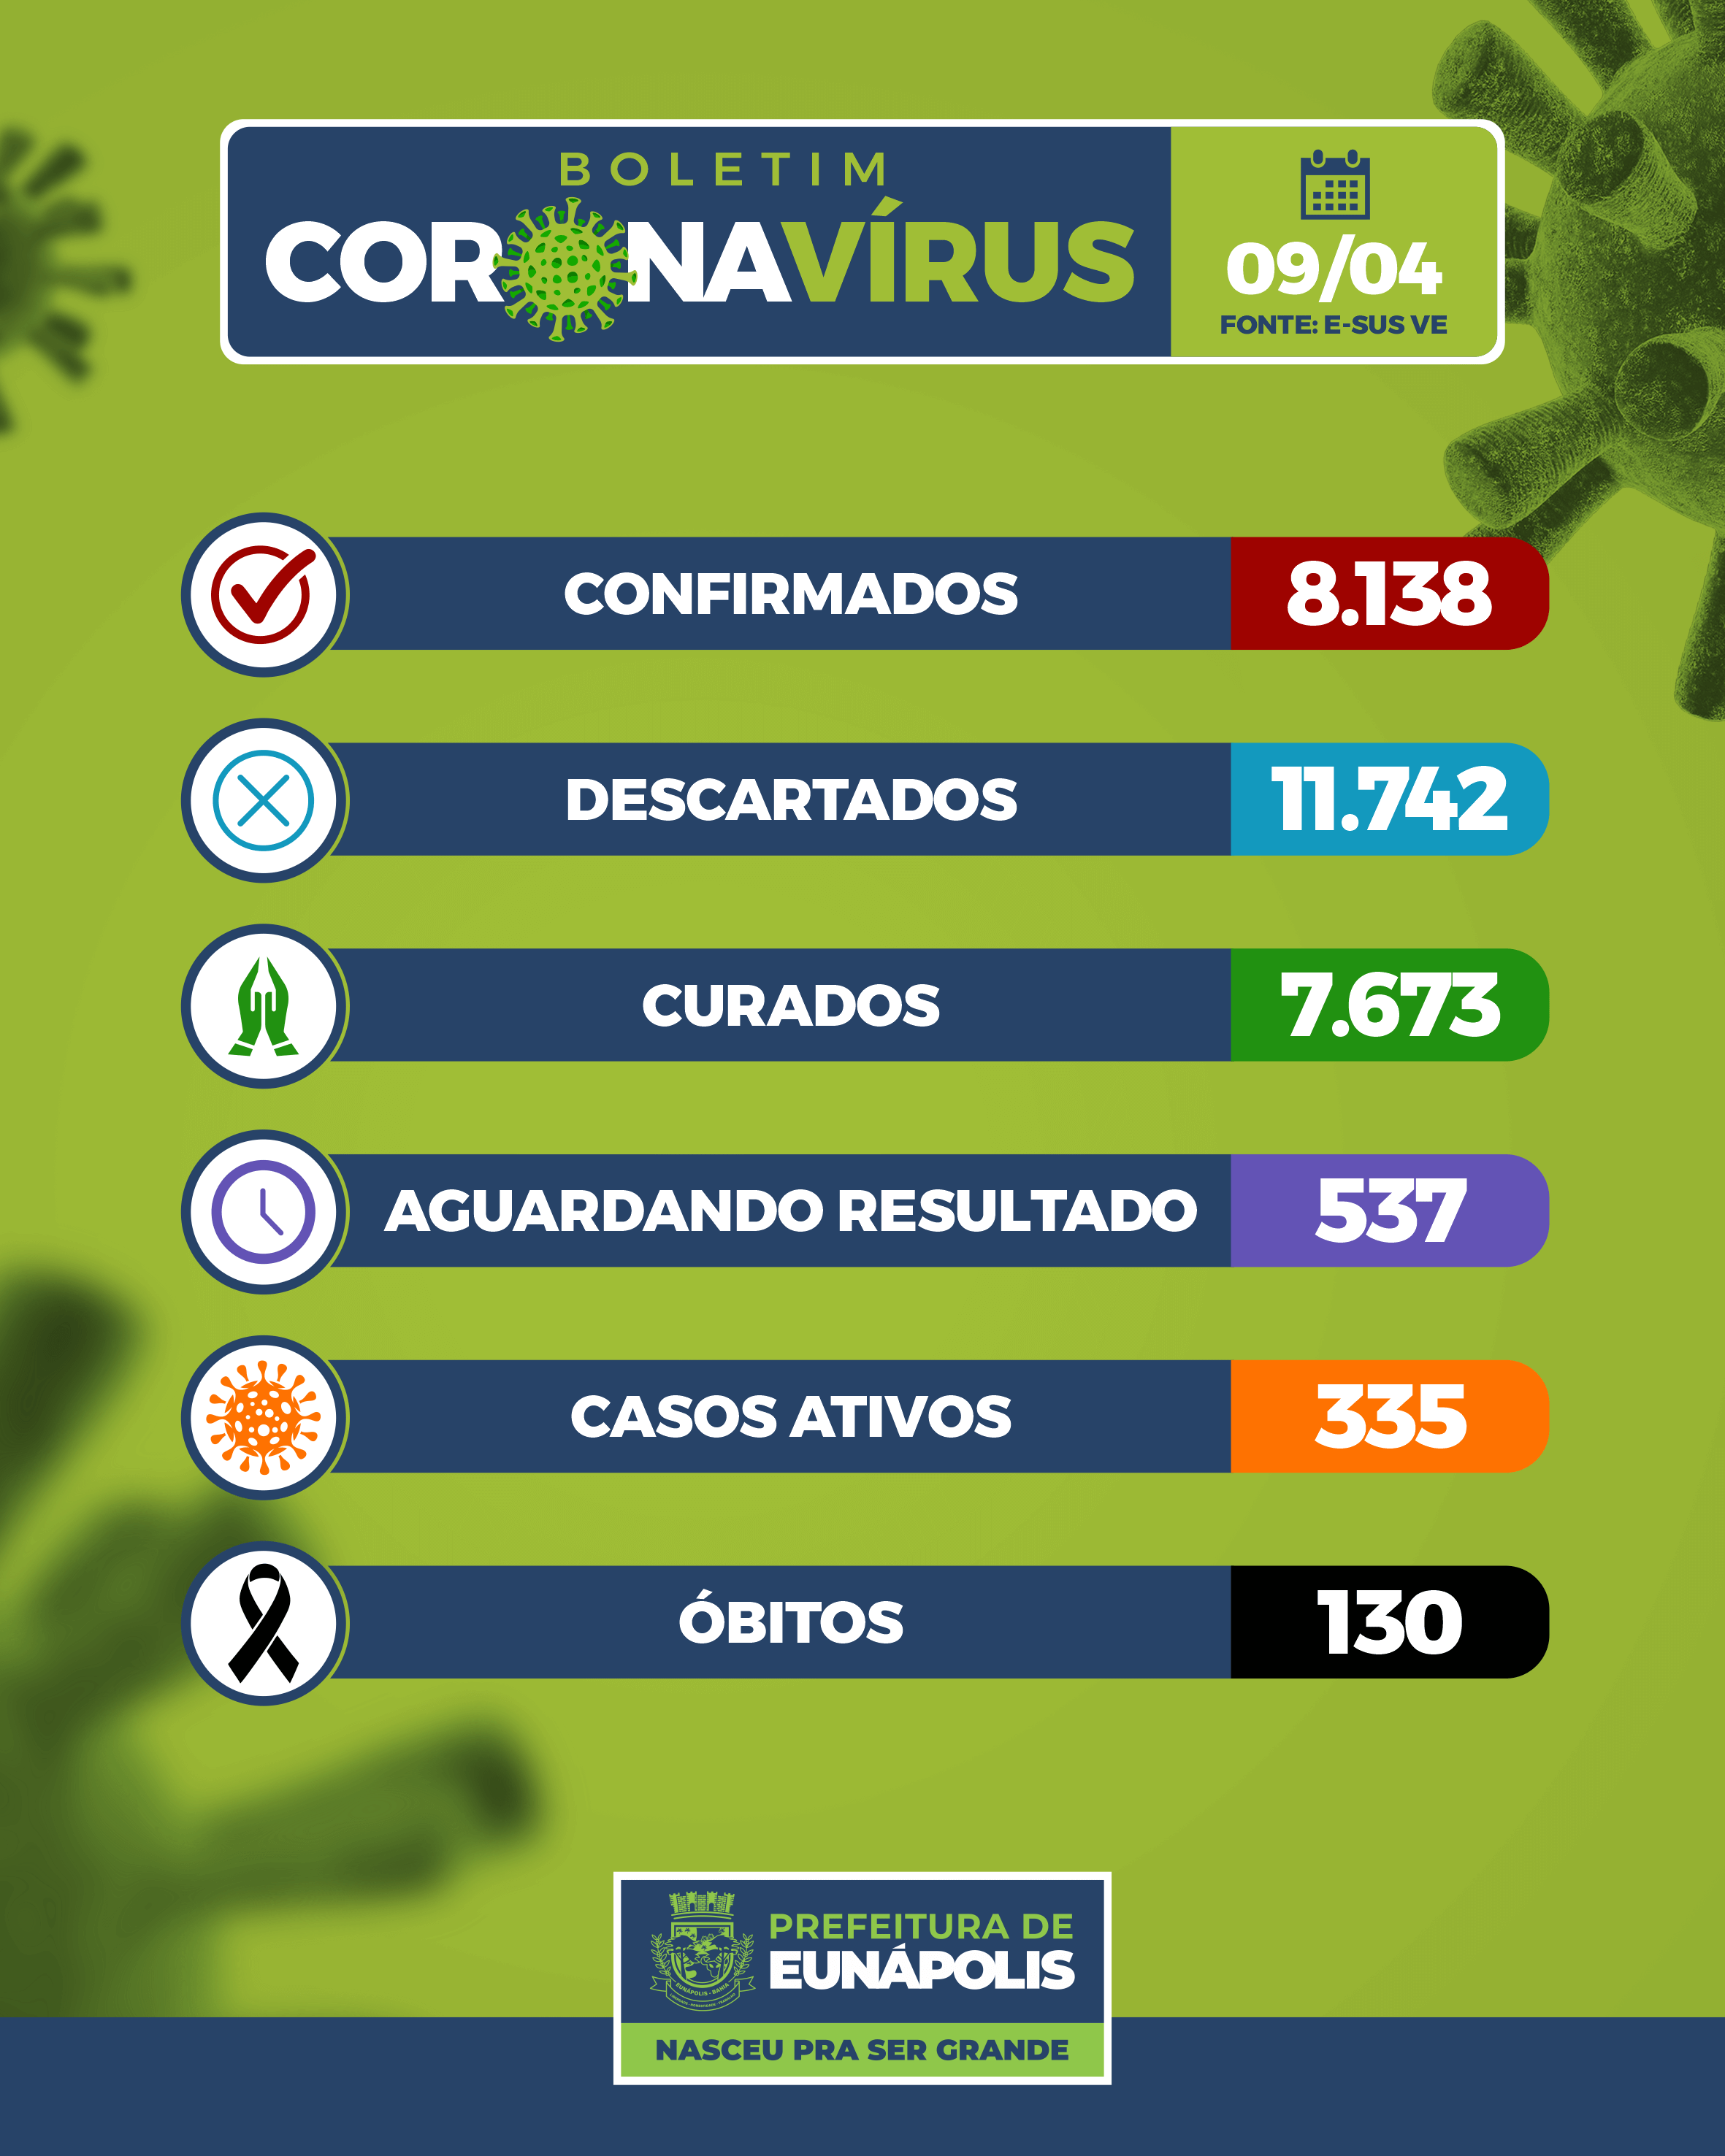 Boletim Epidemiológico Coronavírus do Município de Eunápolis para a data de hoje, 09/04/2021. 23